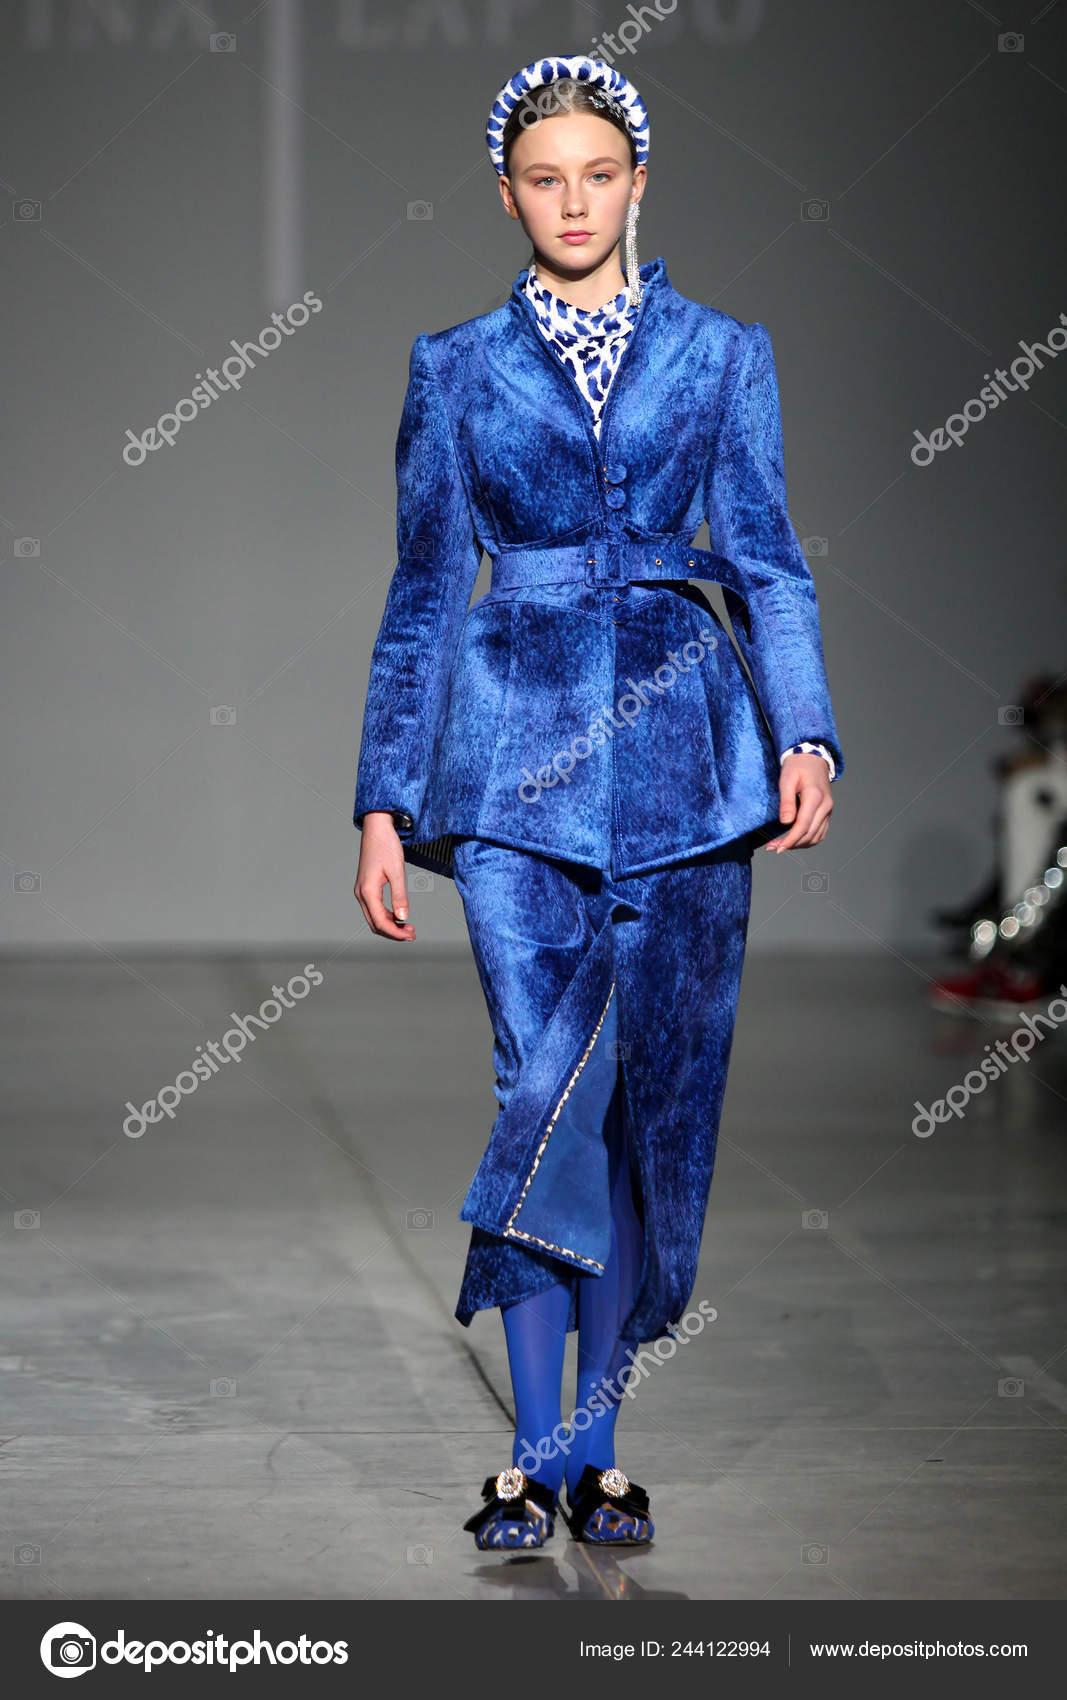 95f72e8303b Kyiv Ukraine February 2019 Kristina Laptso Collection Show Ukrainian Fashion  — Stock Photo